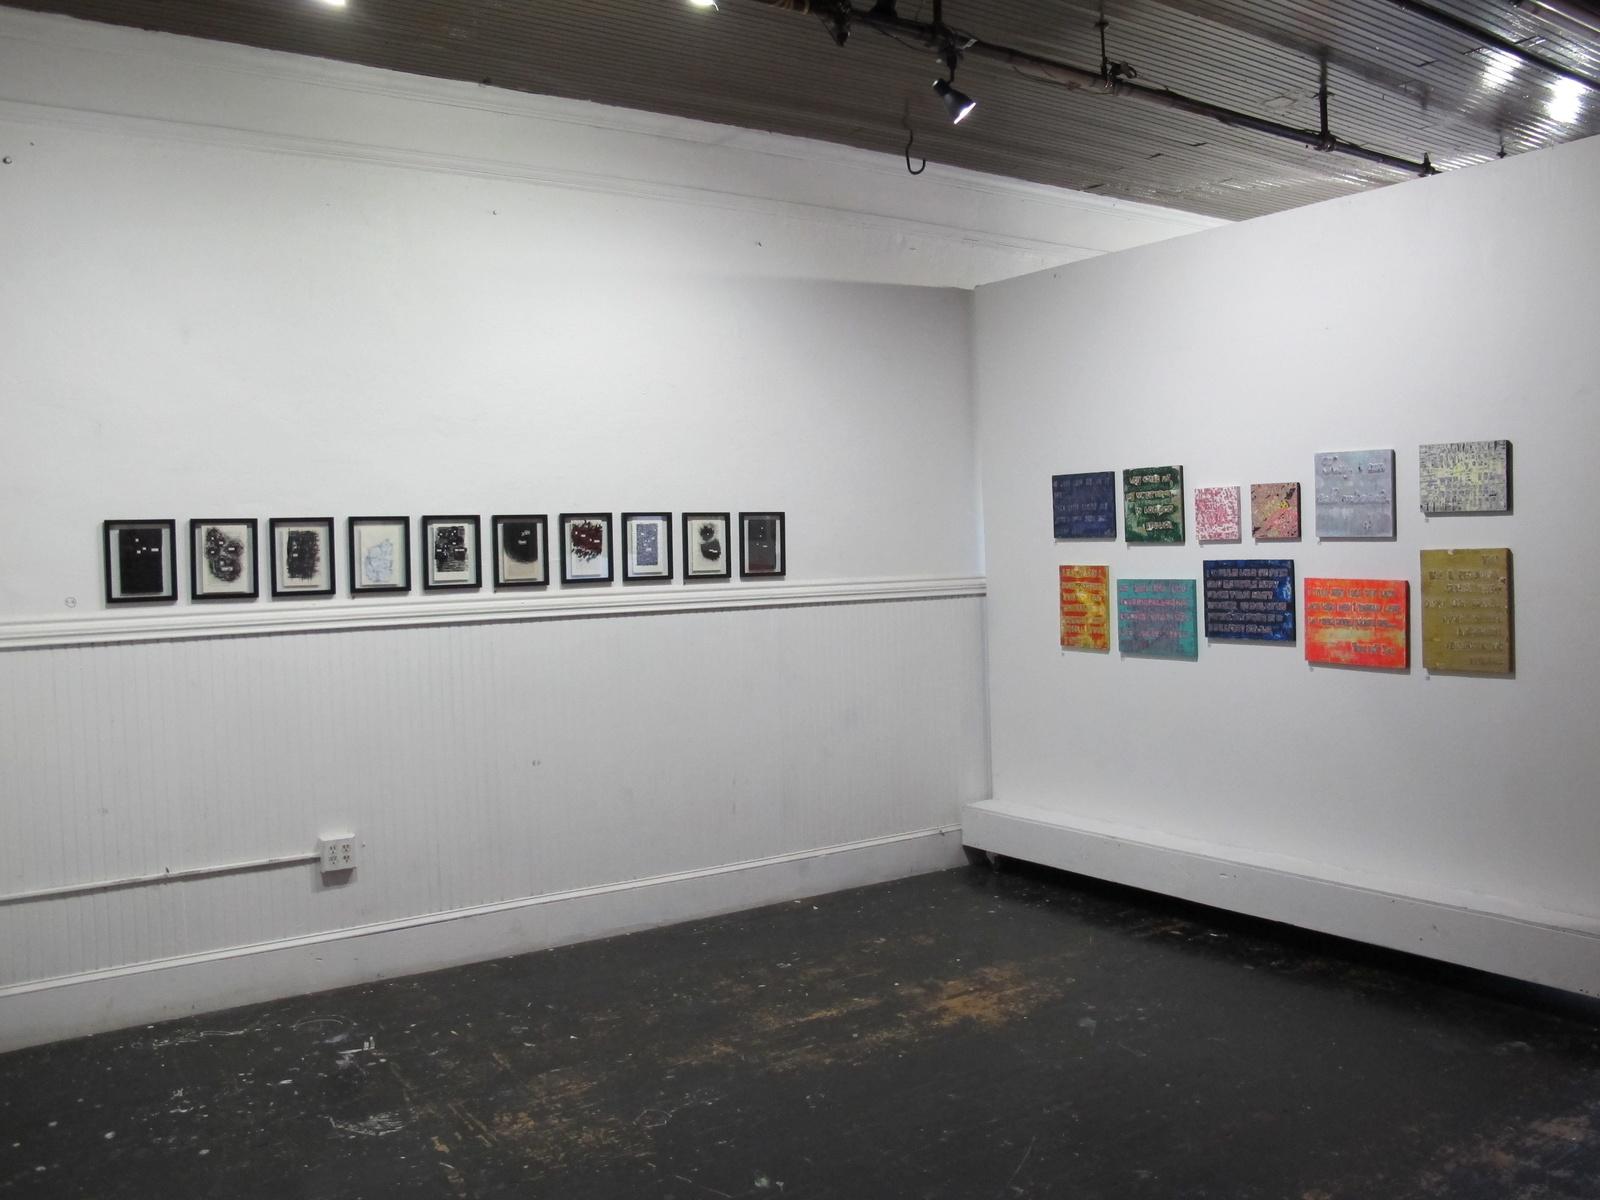 Installation View - Beyond the Vernacular, Mammal Gallery, Oct-Nov 2014